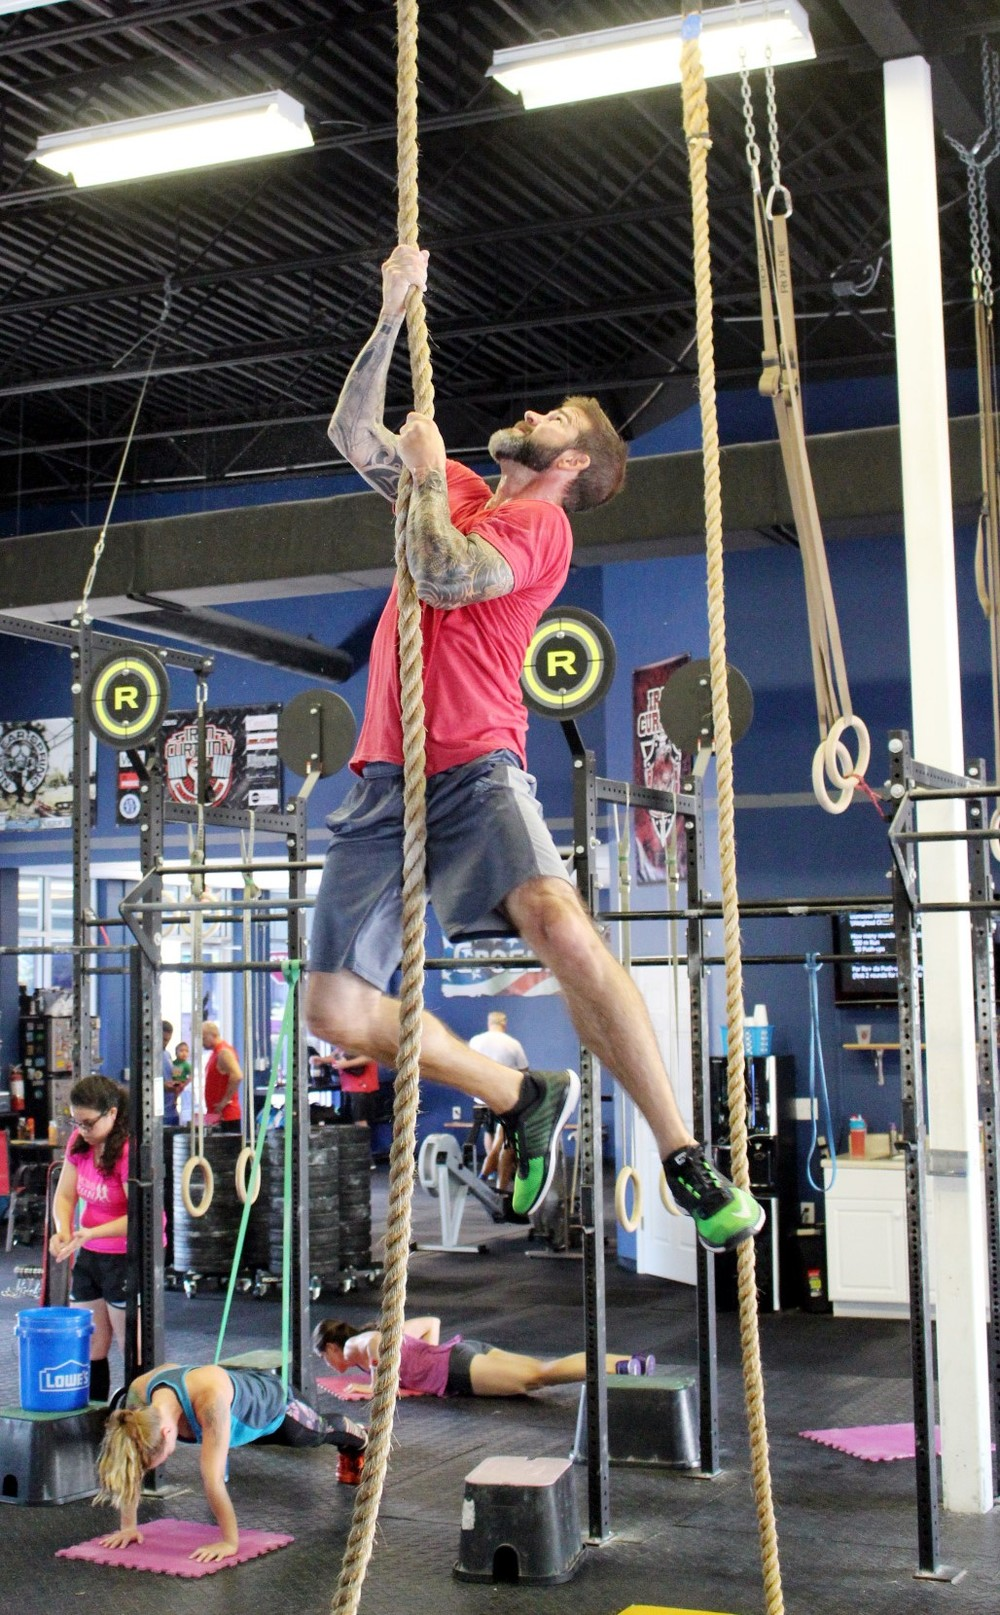 Heath doing a legless rope climb